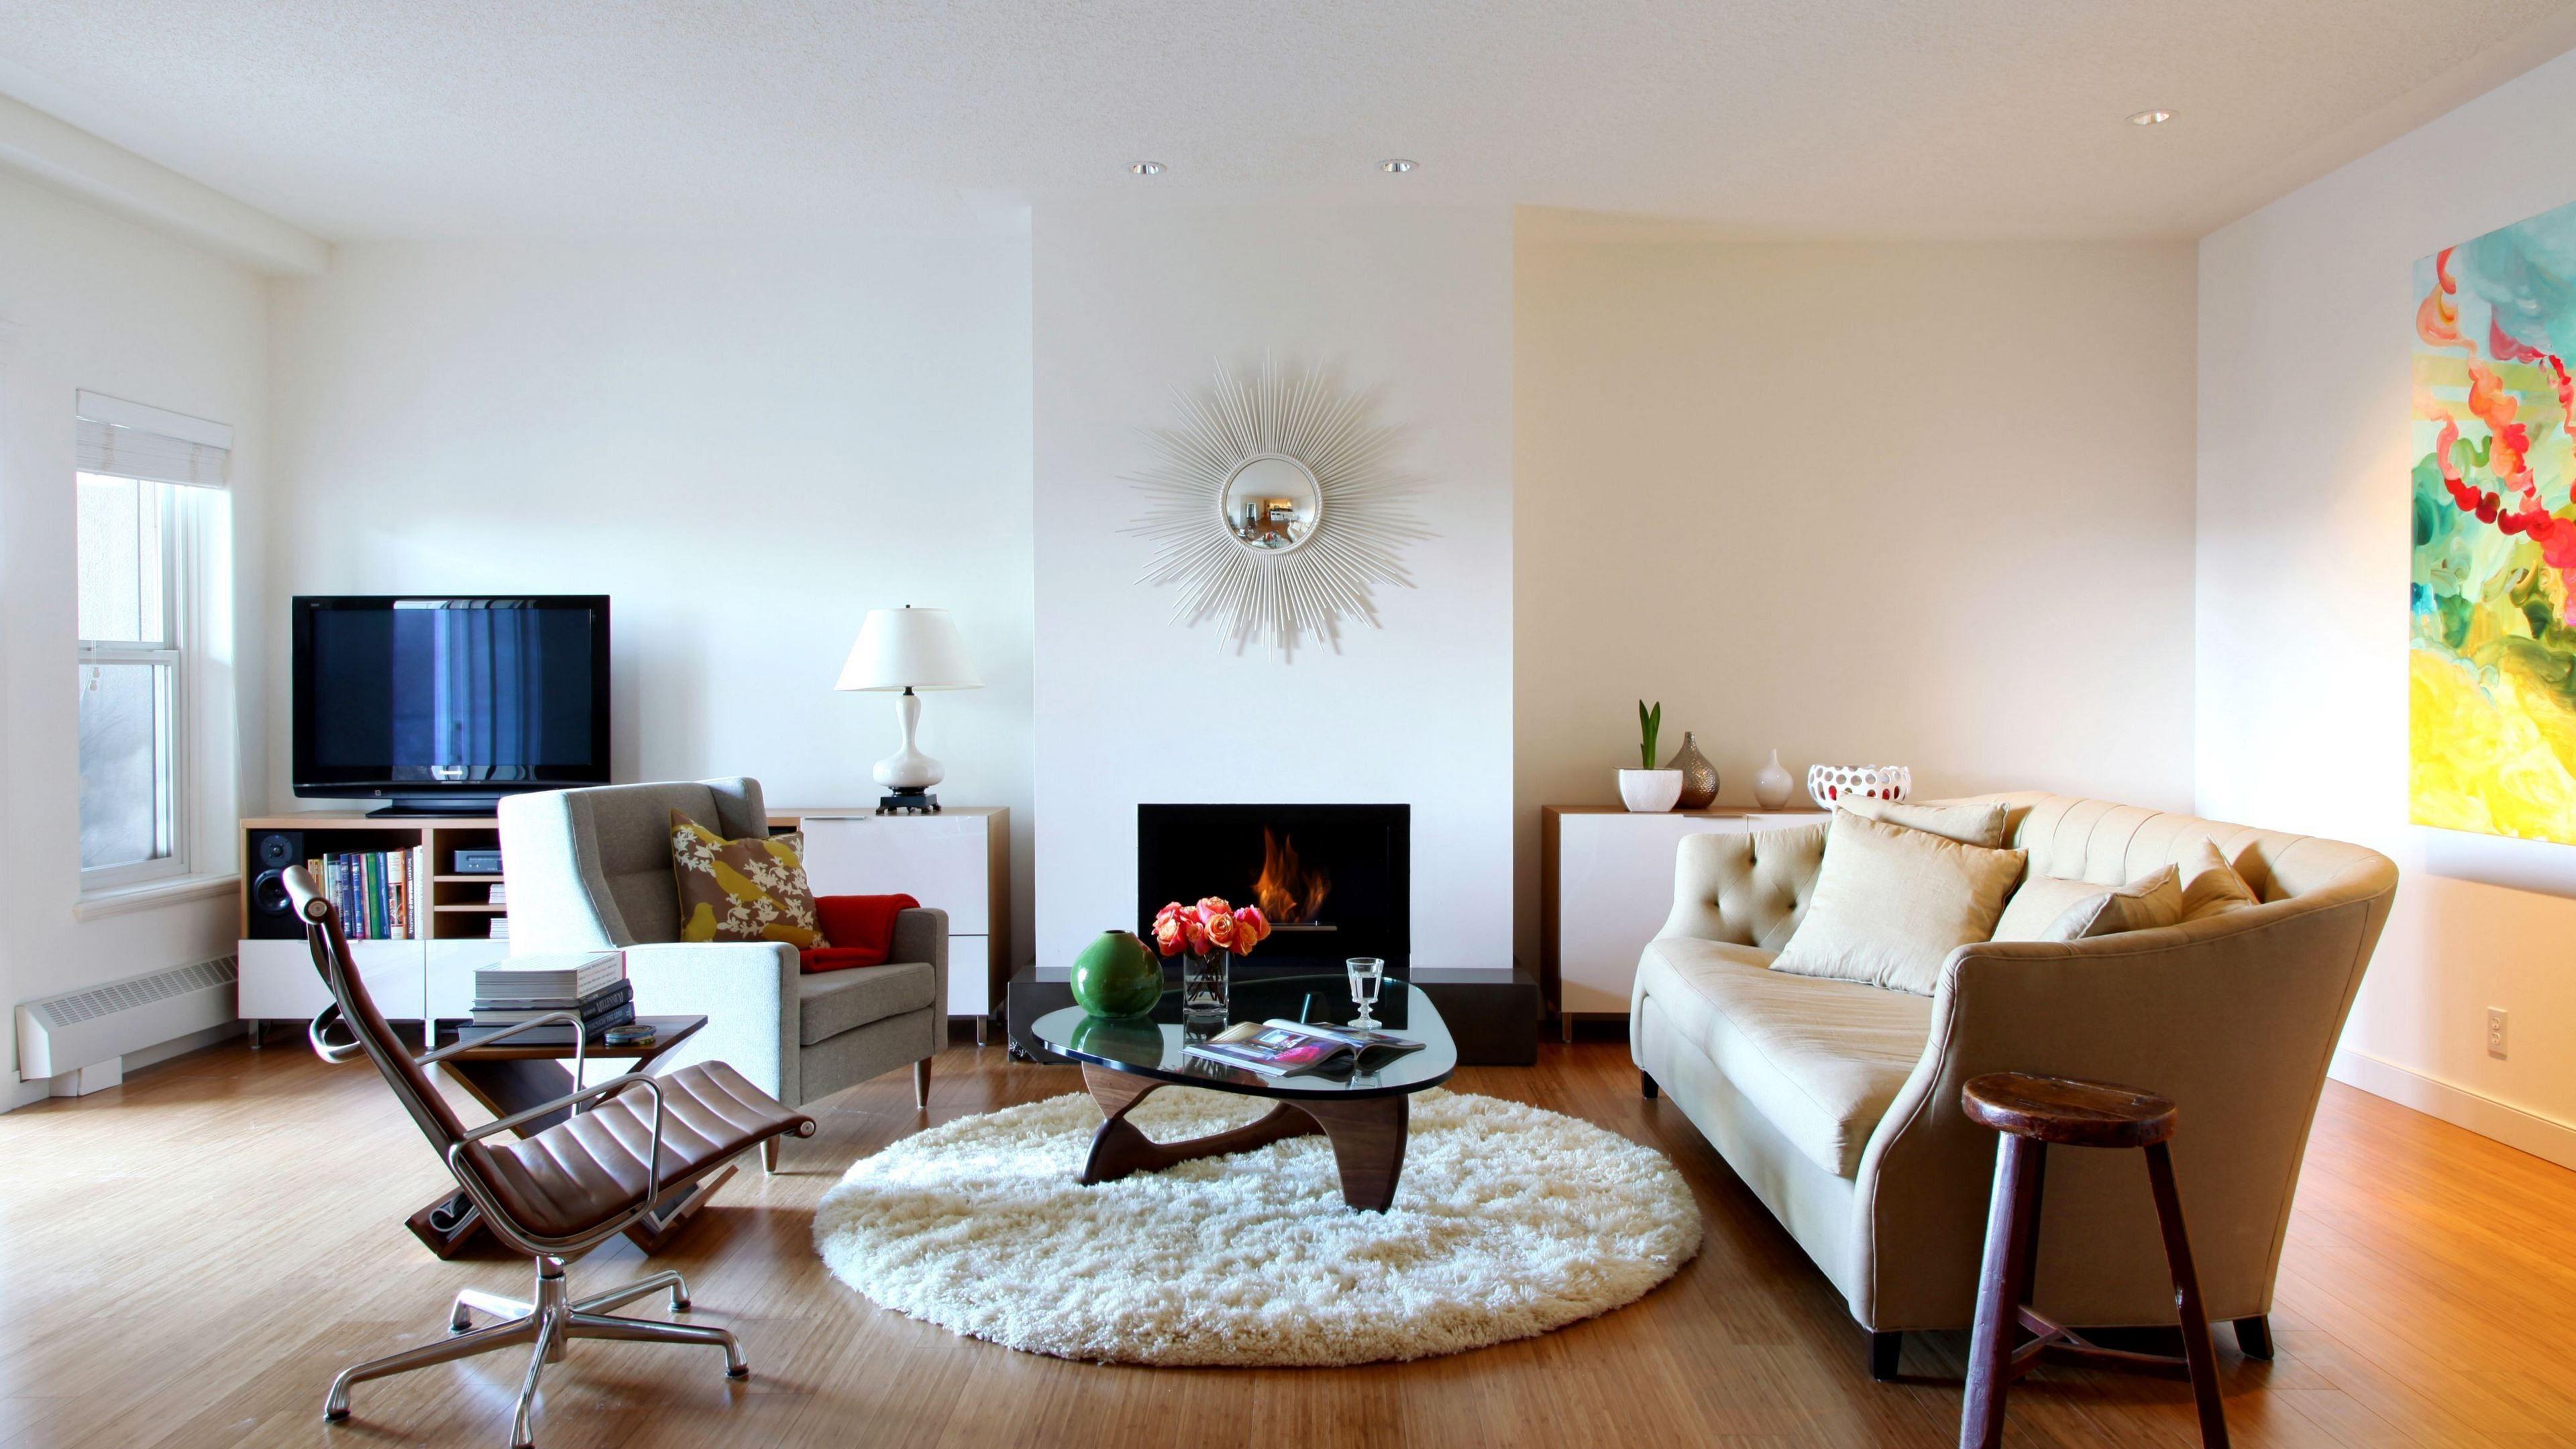 Living Room Fireplace 3840x2160 Ultra Hd Wallpaper Living Room Designs House Interior Minimalist Living Room